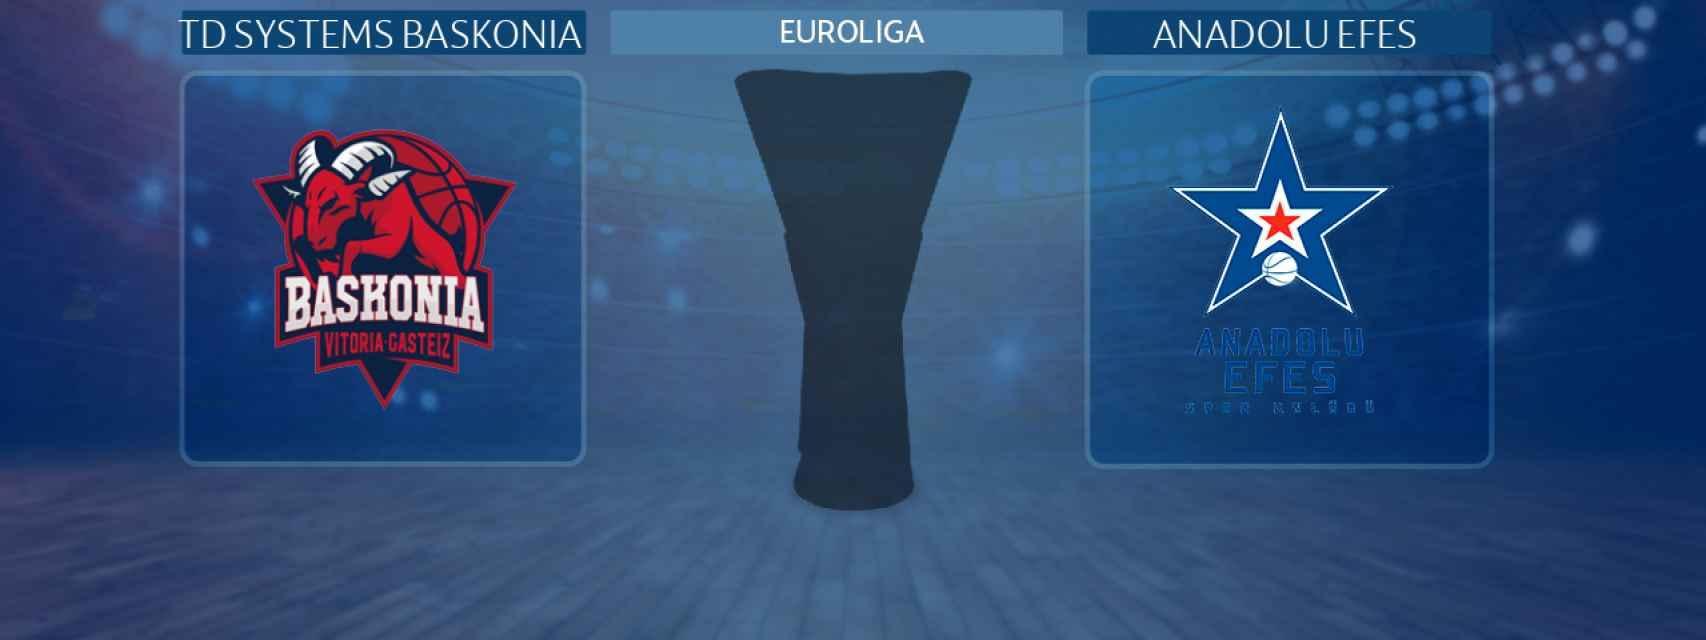 TD Systems Baskonia - Anadolu Efes, partido de la Euroliga